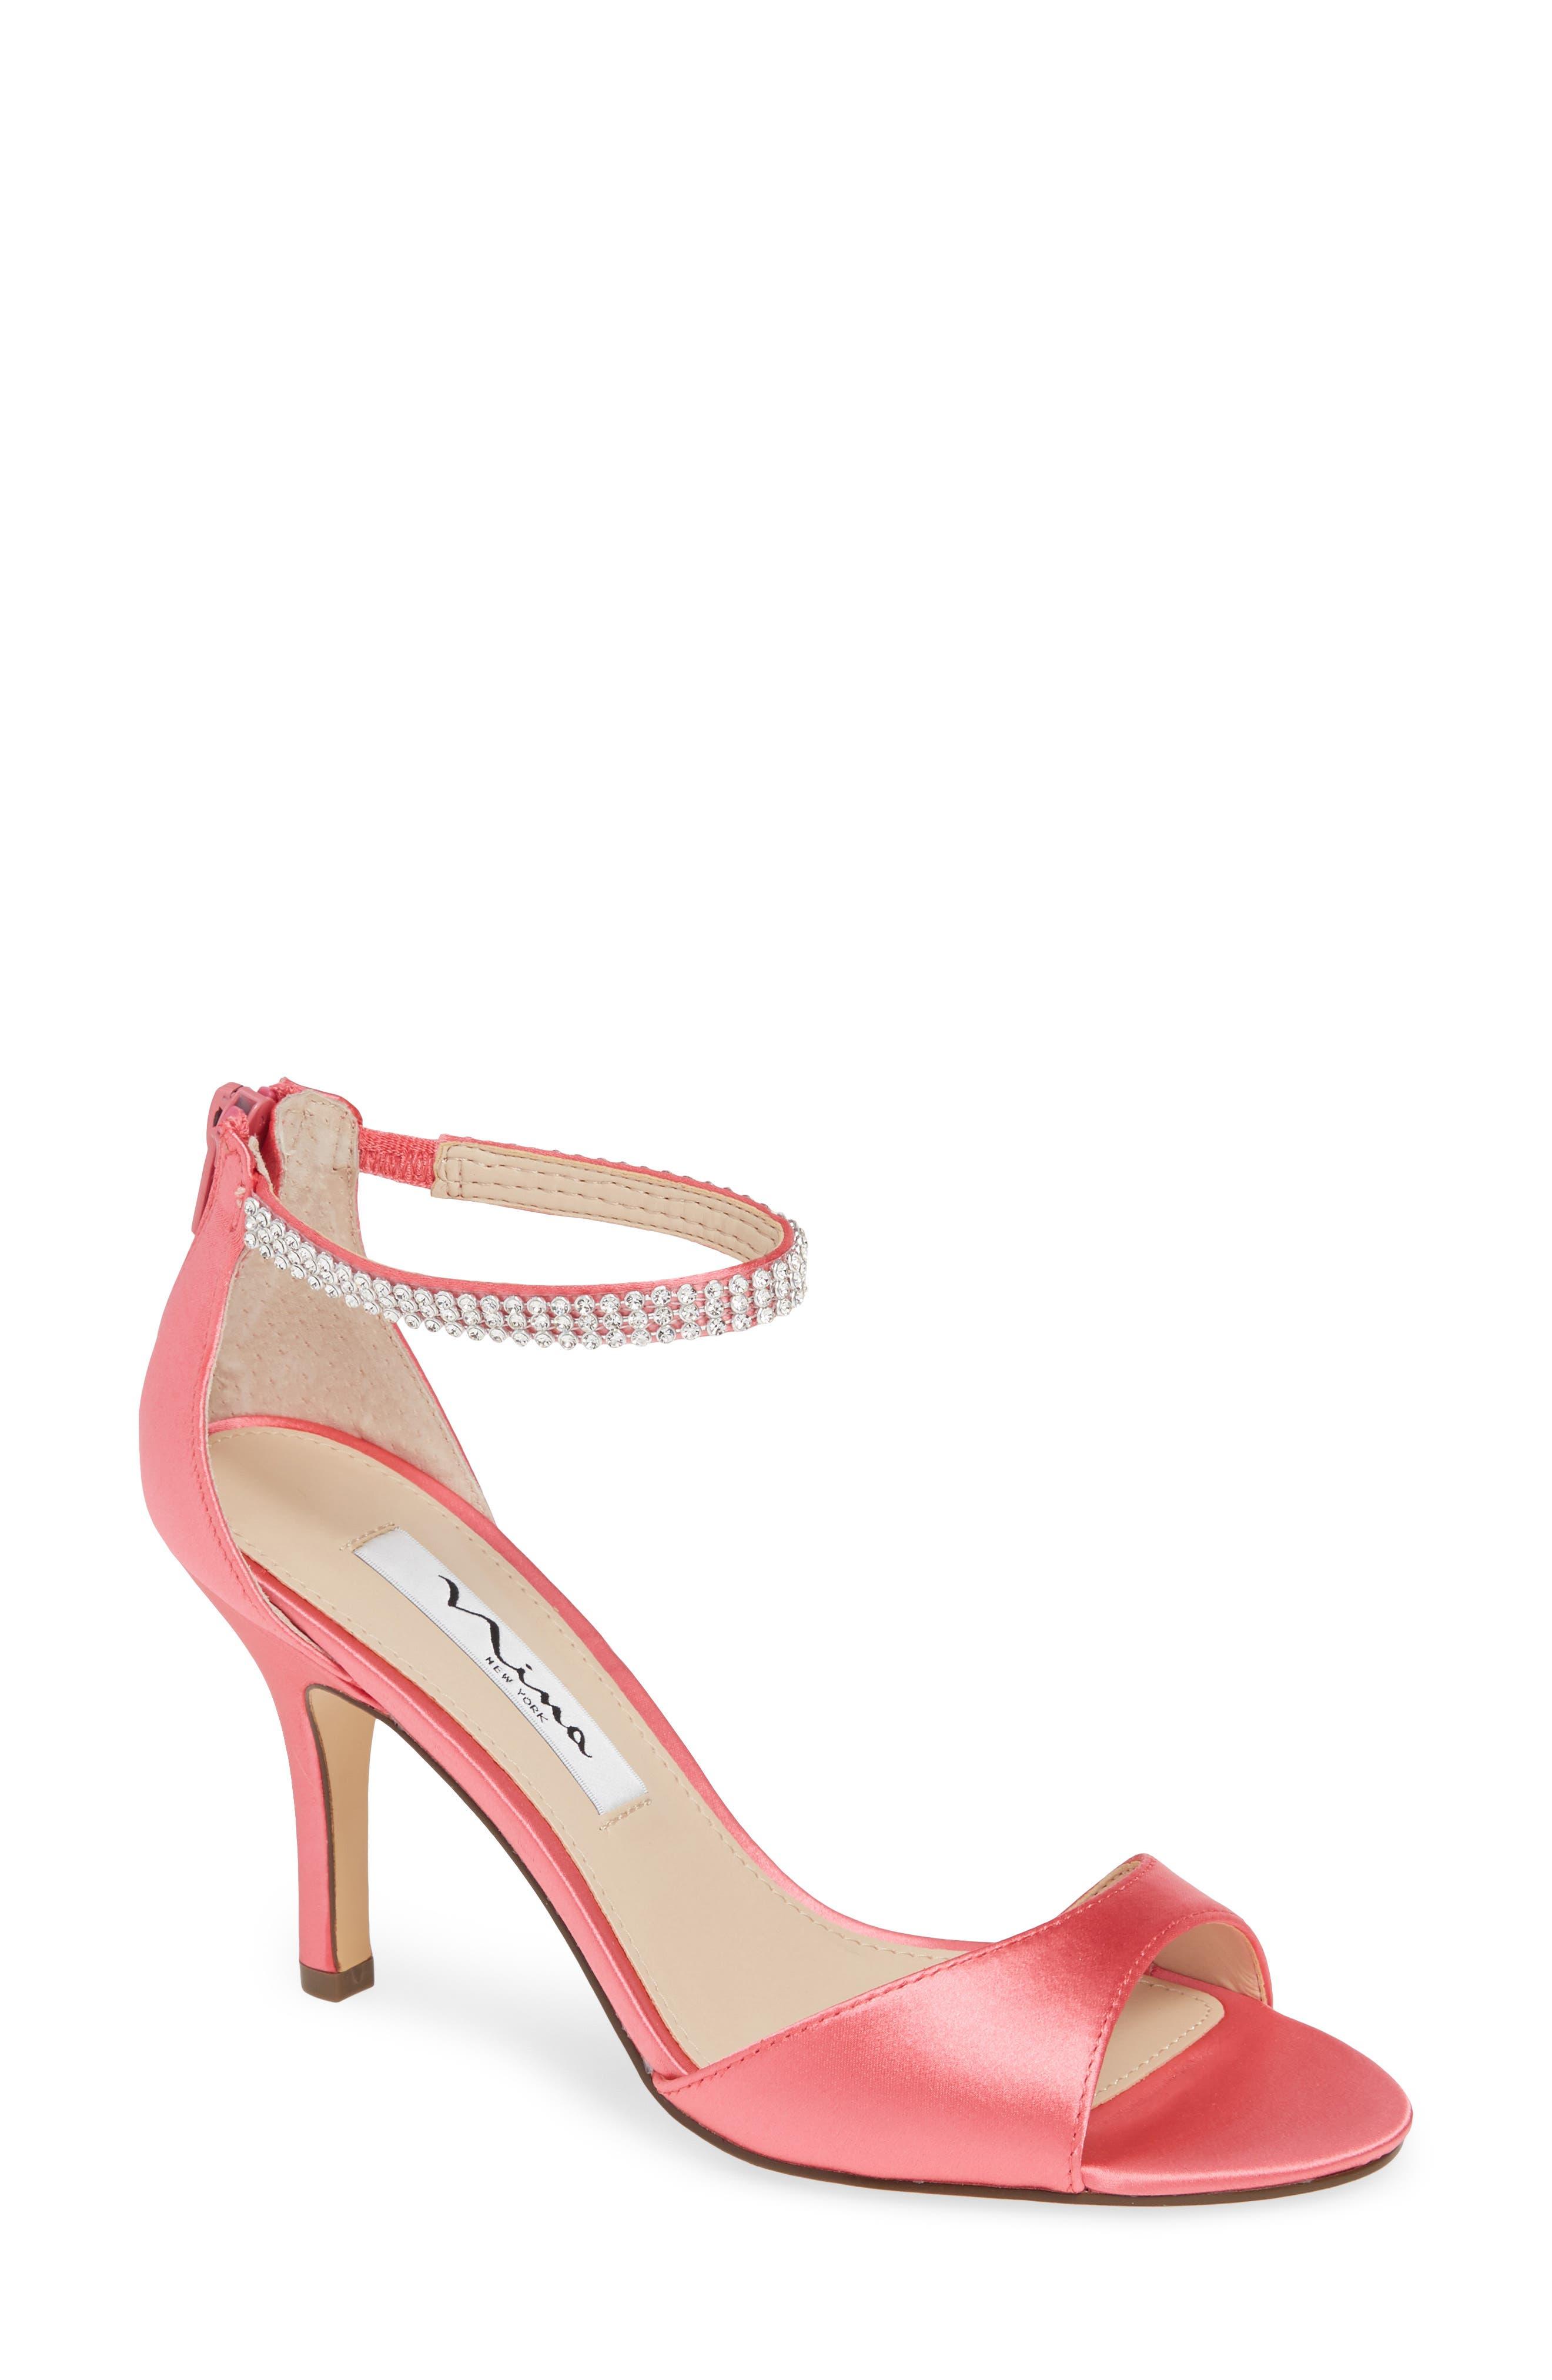 NINA Volanda Ankle Strap Sandal, Main, color, STRAWBERRY PUNCH SATIN